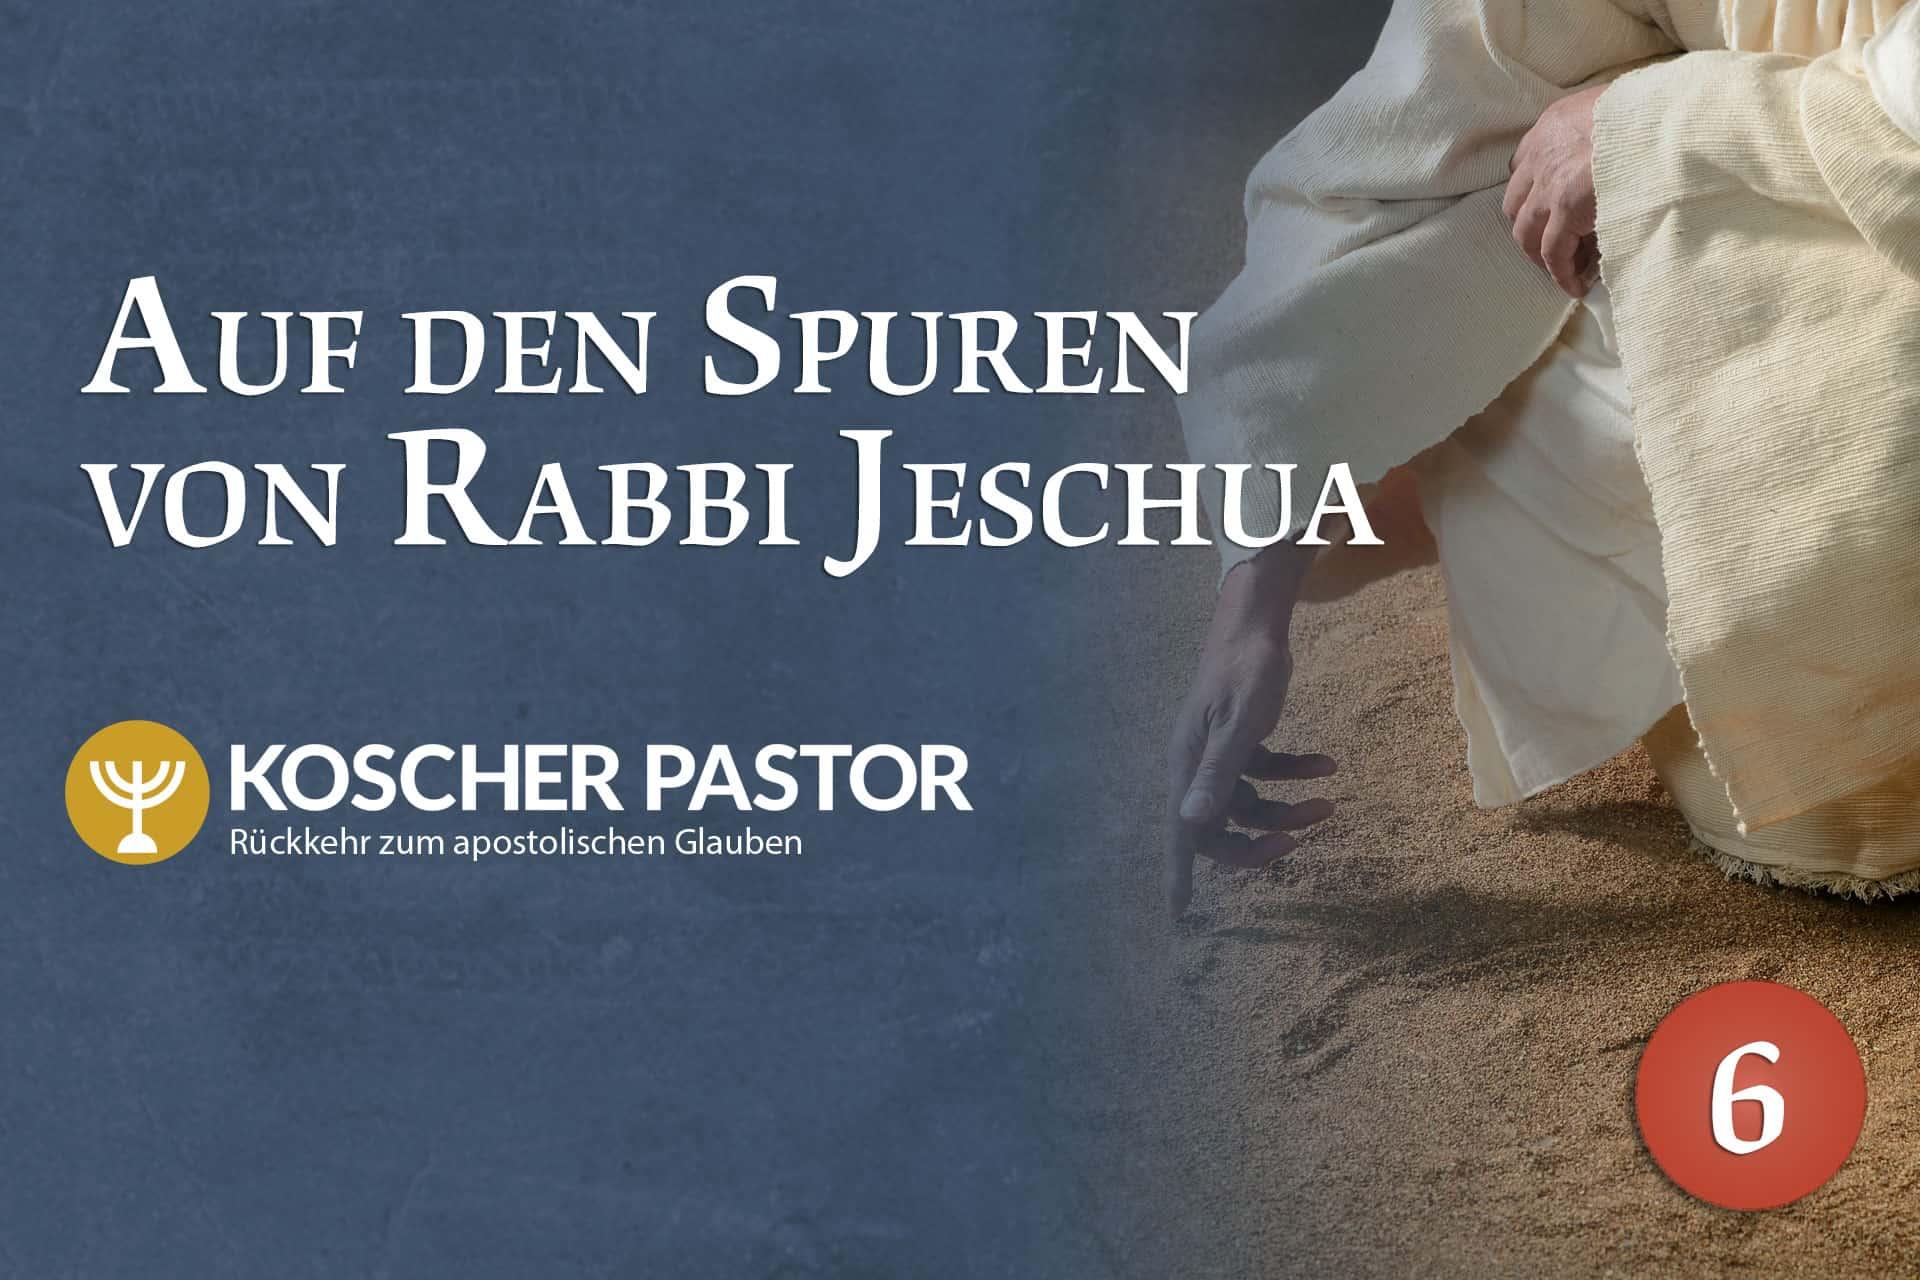 cover_kosher_pastor_GER_module_6